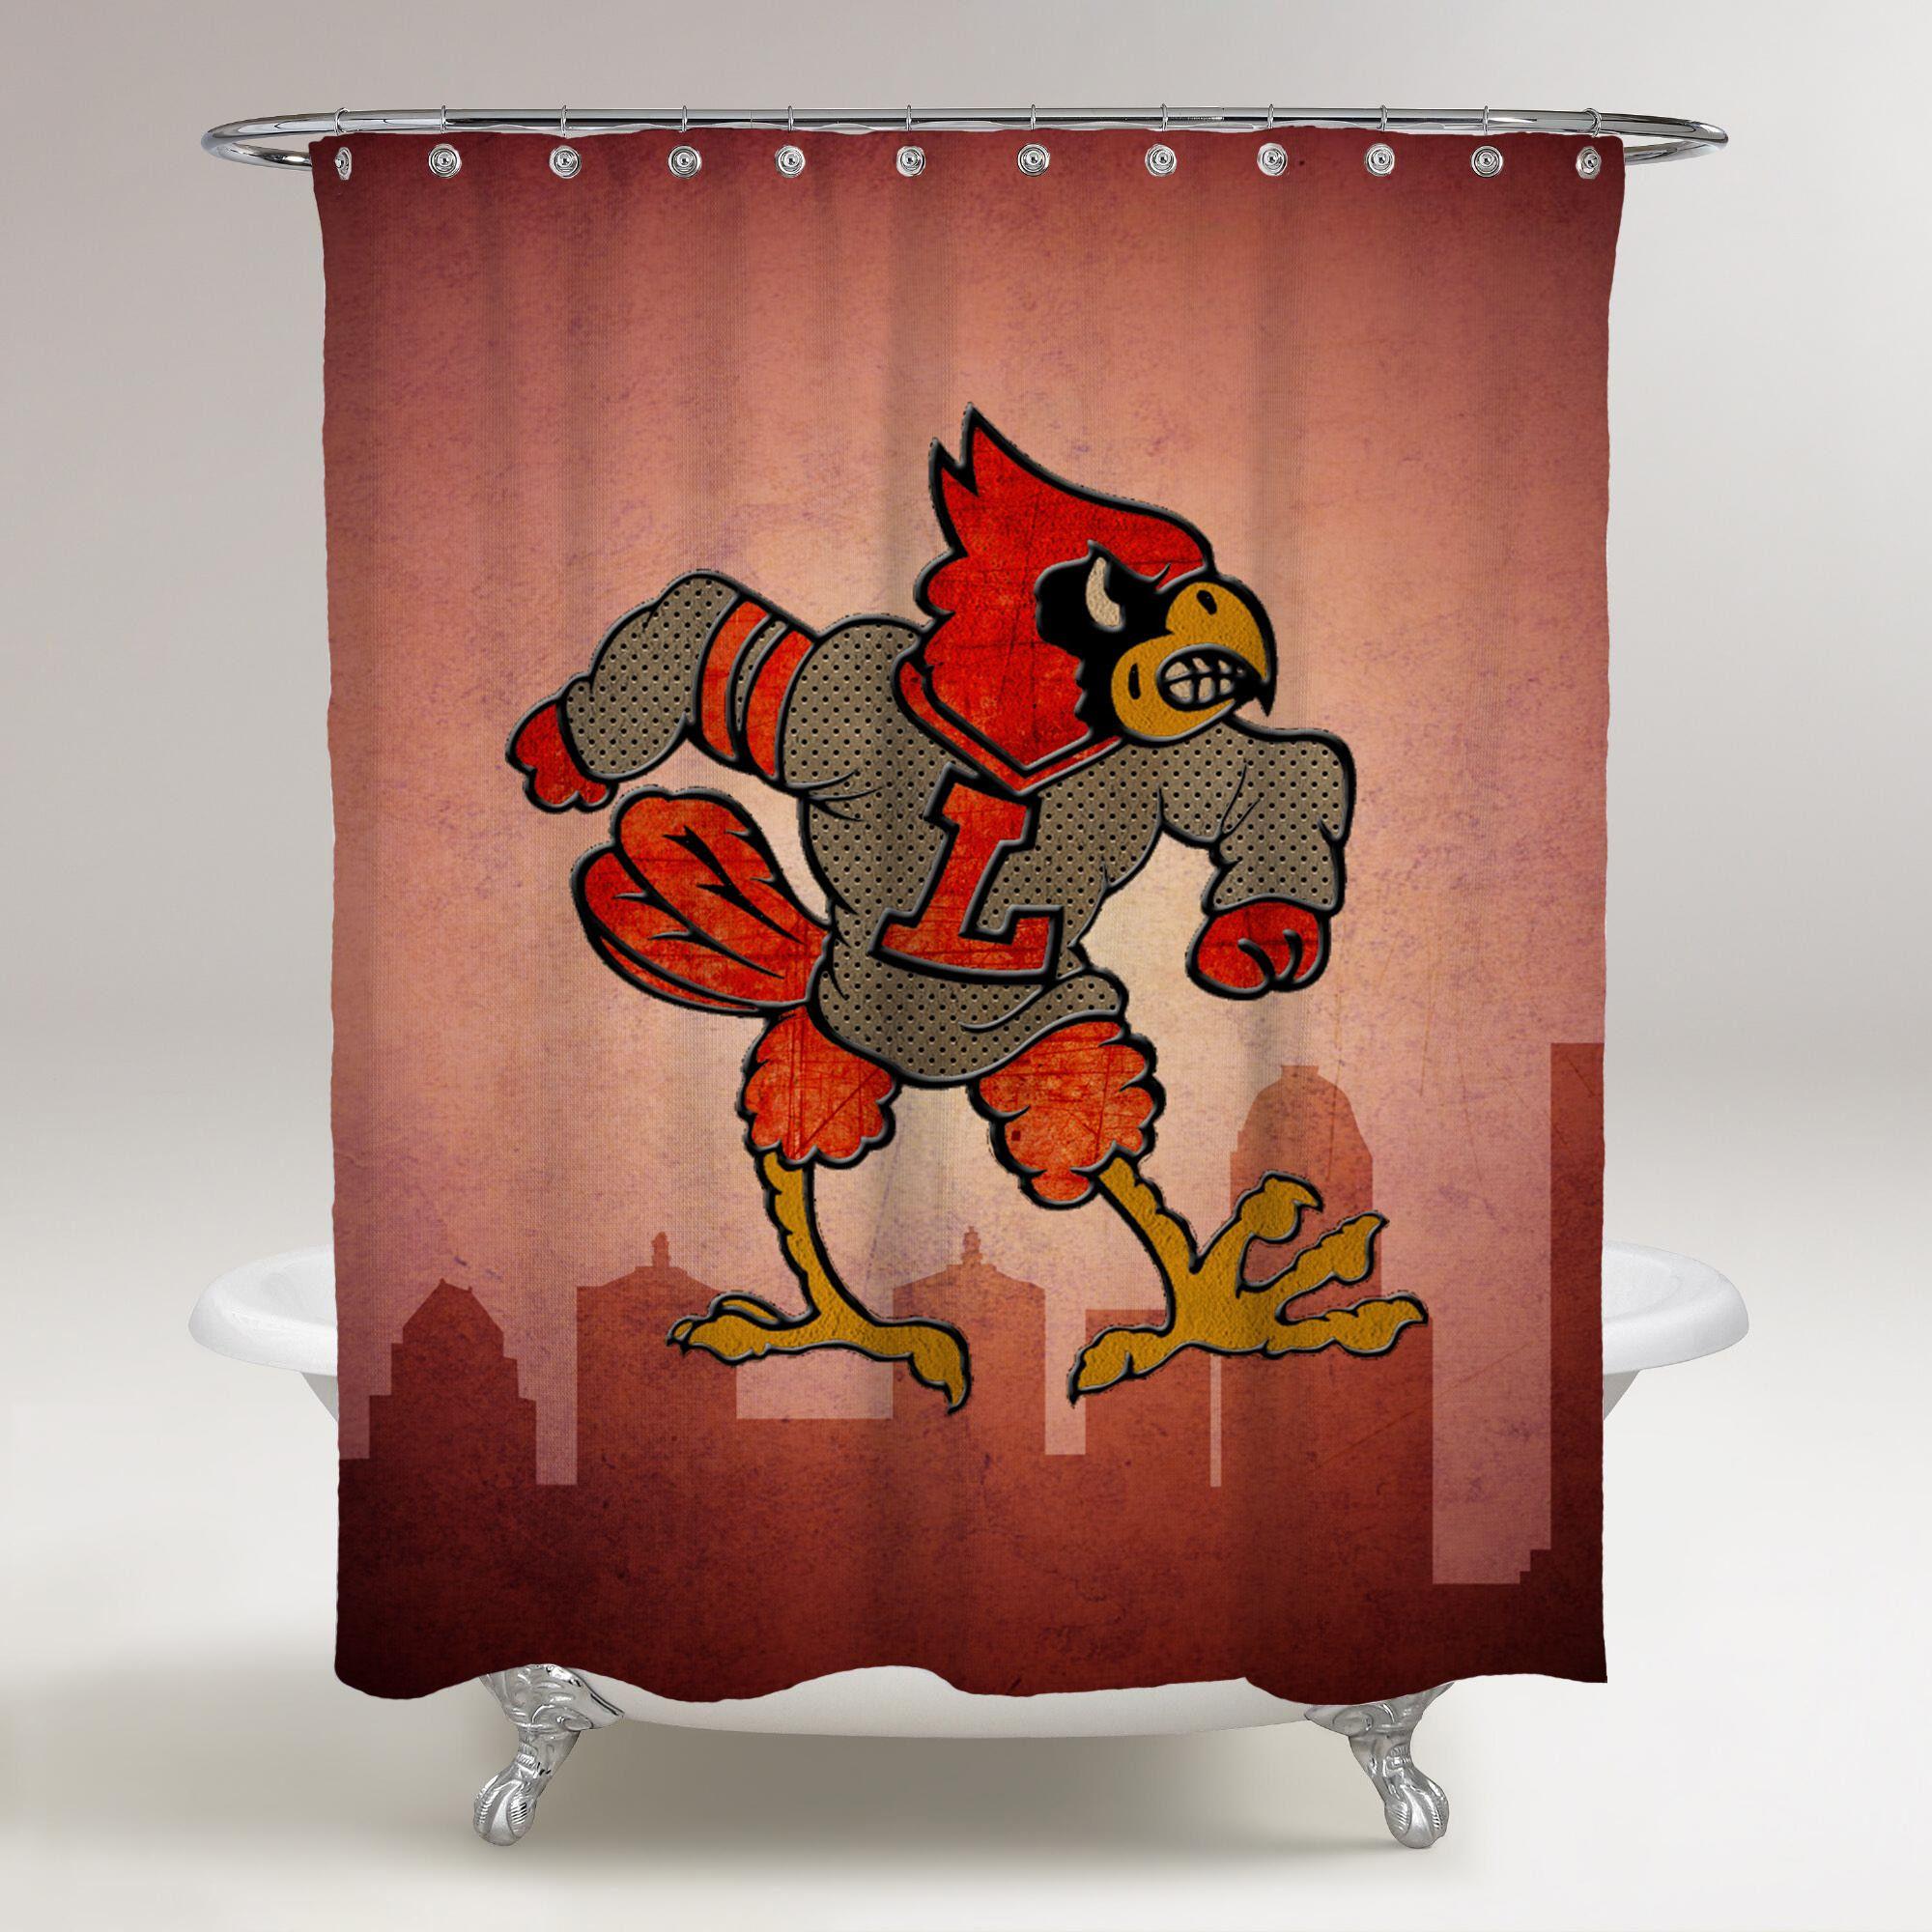 Louisville Cardinals Logo City Background Printed Shower Curtain